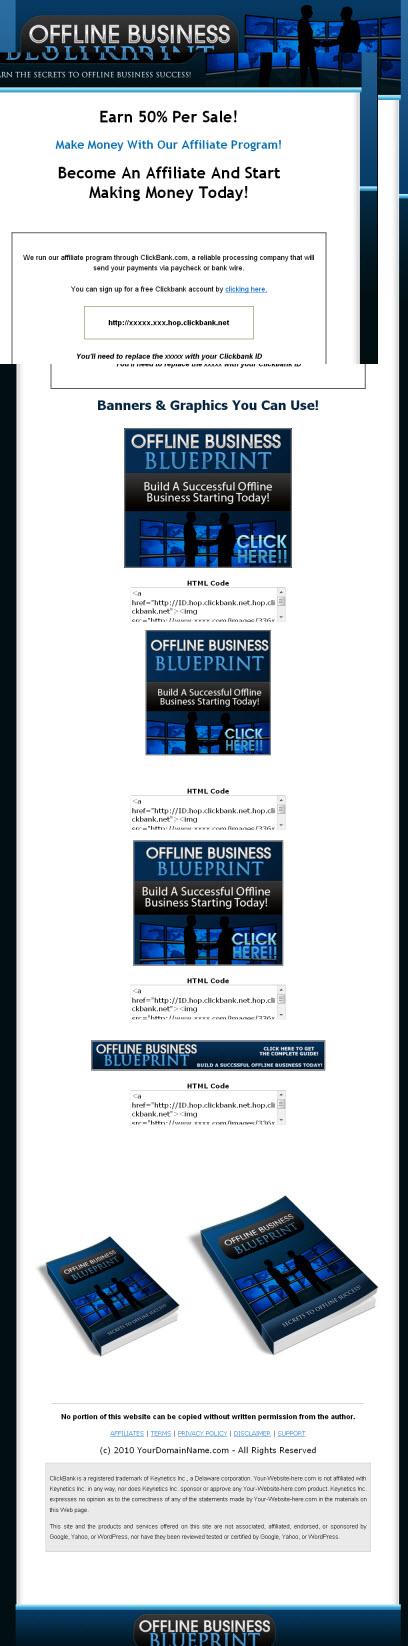 Offline business blueprint viral ebook master resale rights more images malvernweather Choice Image